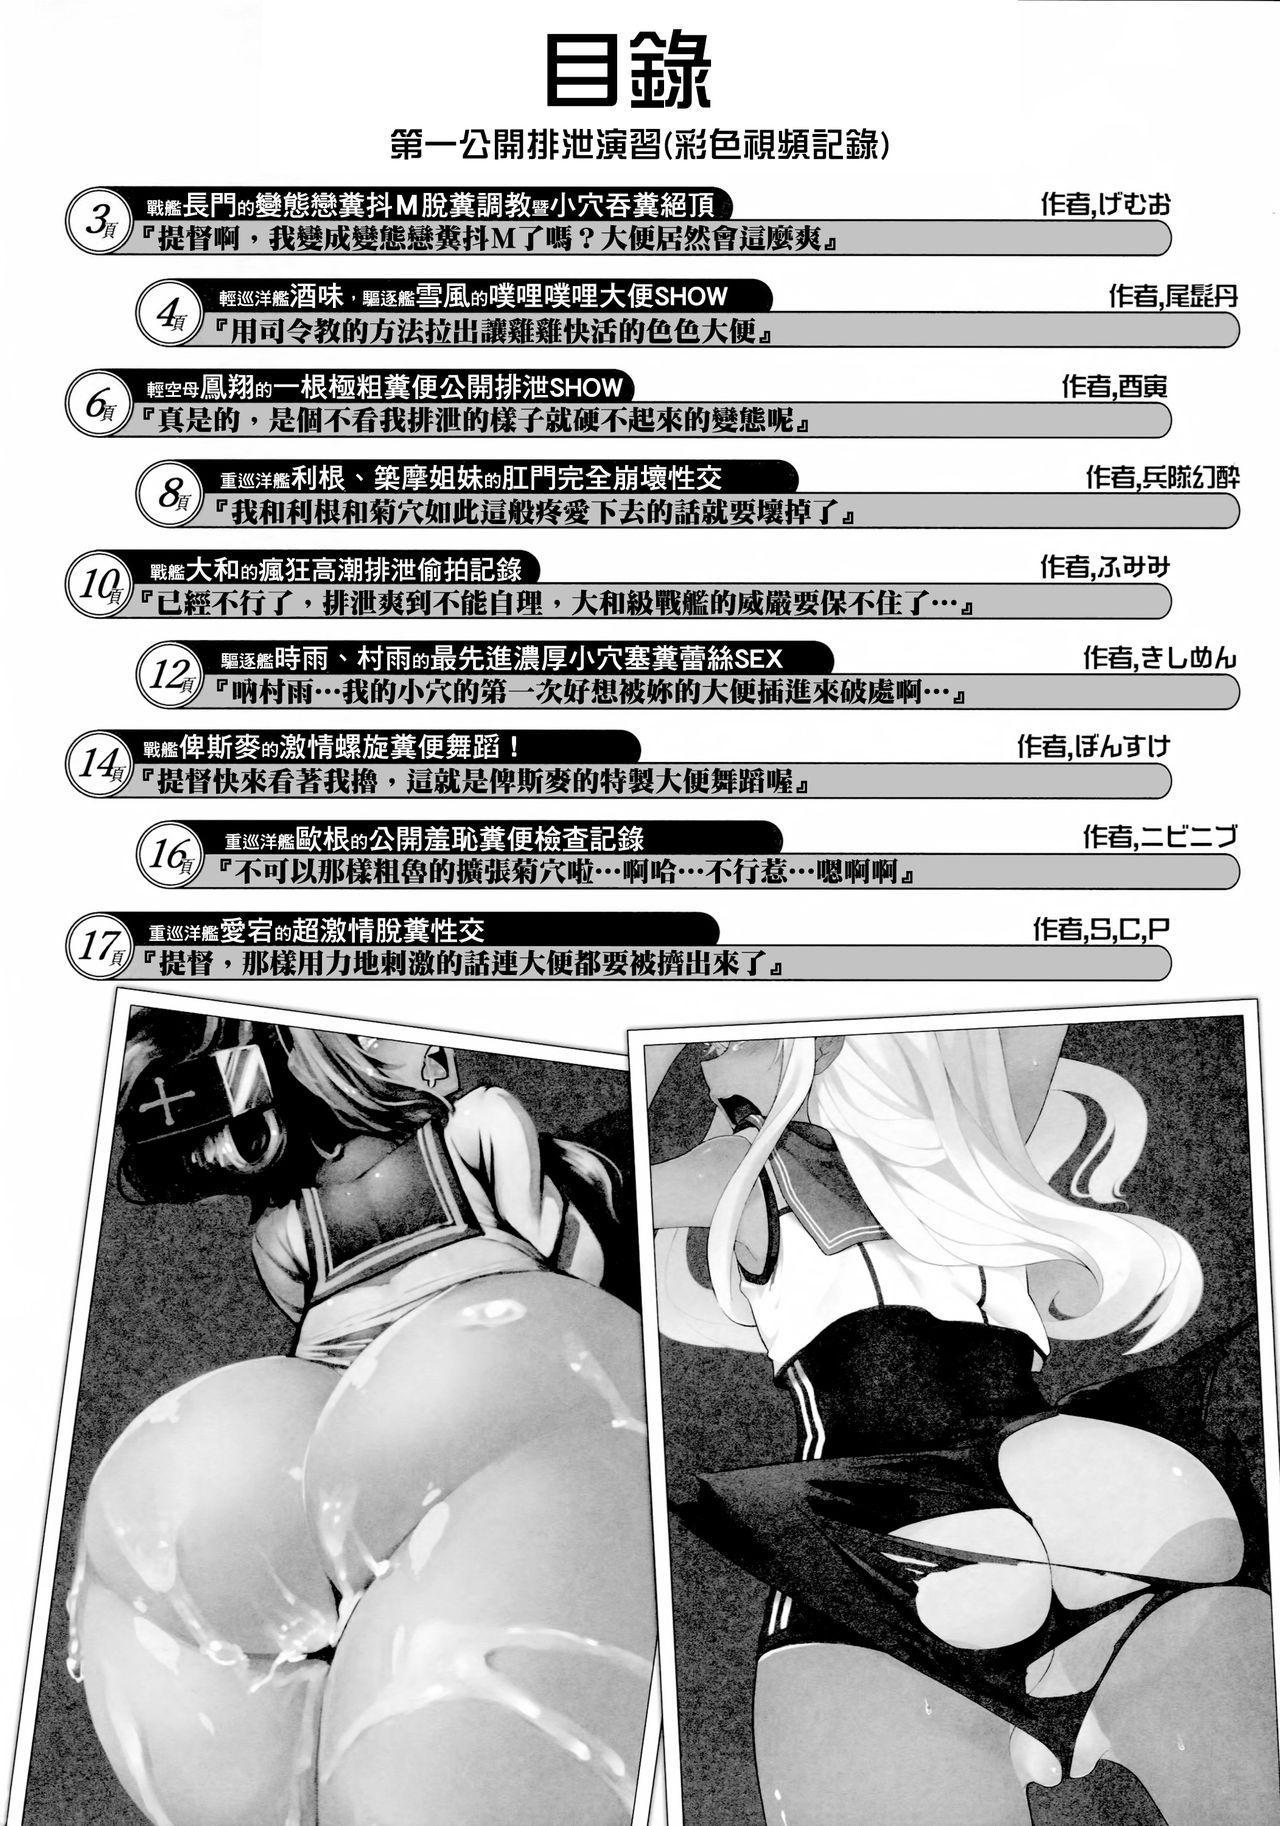 KanColle Haisetsu Sex Goudoushi LoveSca! Goudou Enshuu!! | 艦C排泄性交合同誌 激情糞便! 聯合演習!! 19